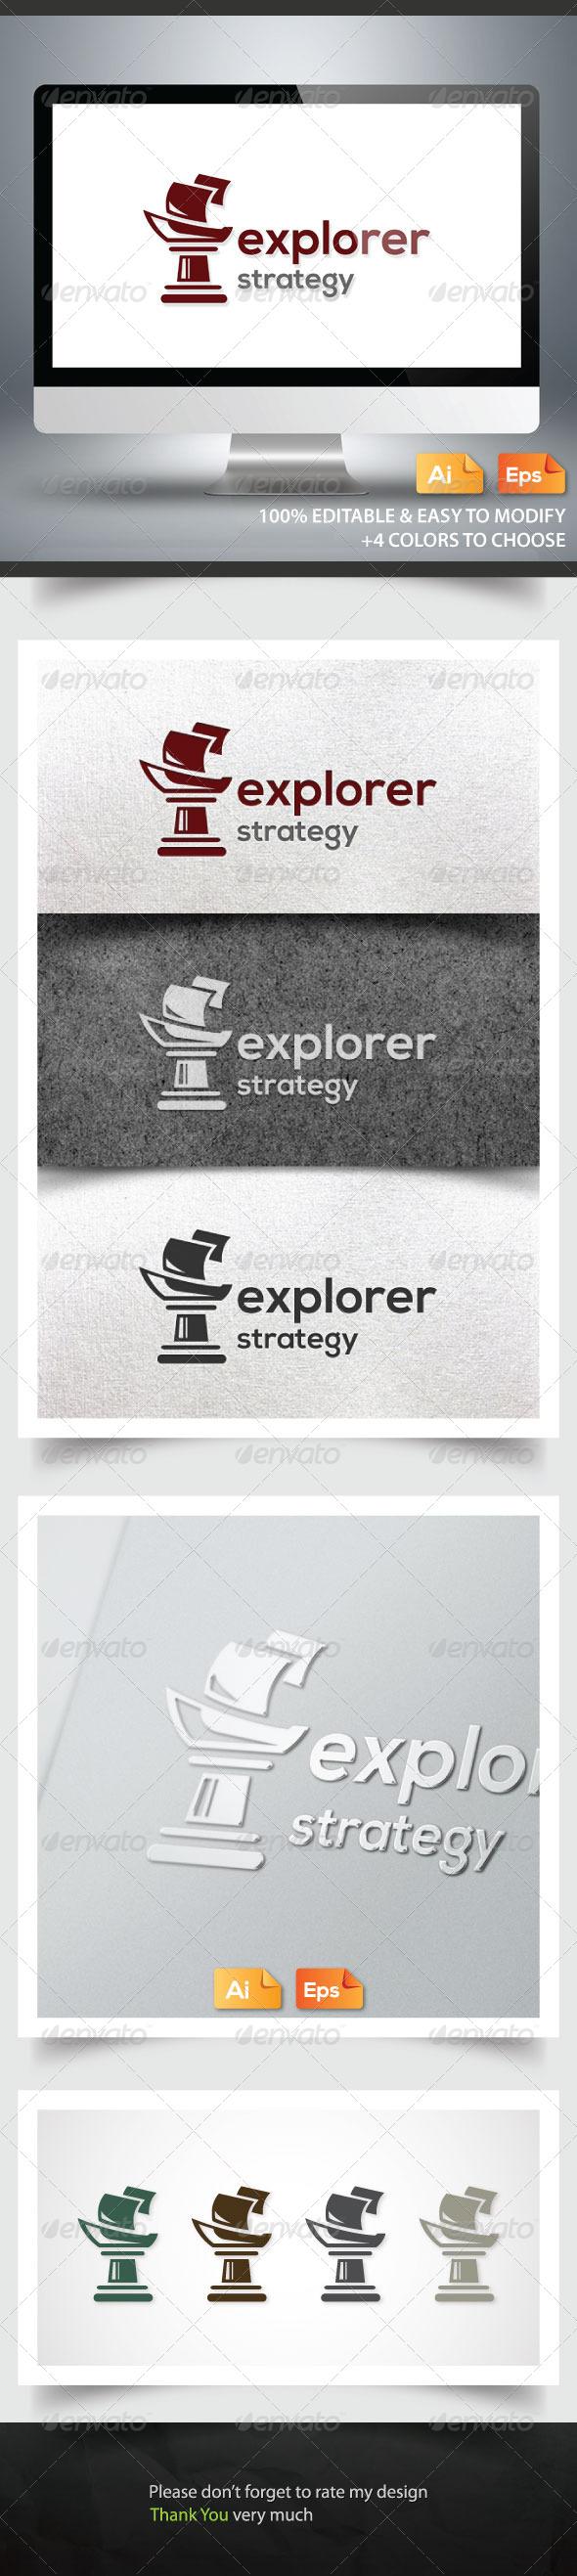 GraphicRiver Explorer Strategy 6184953